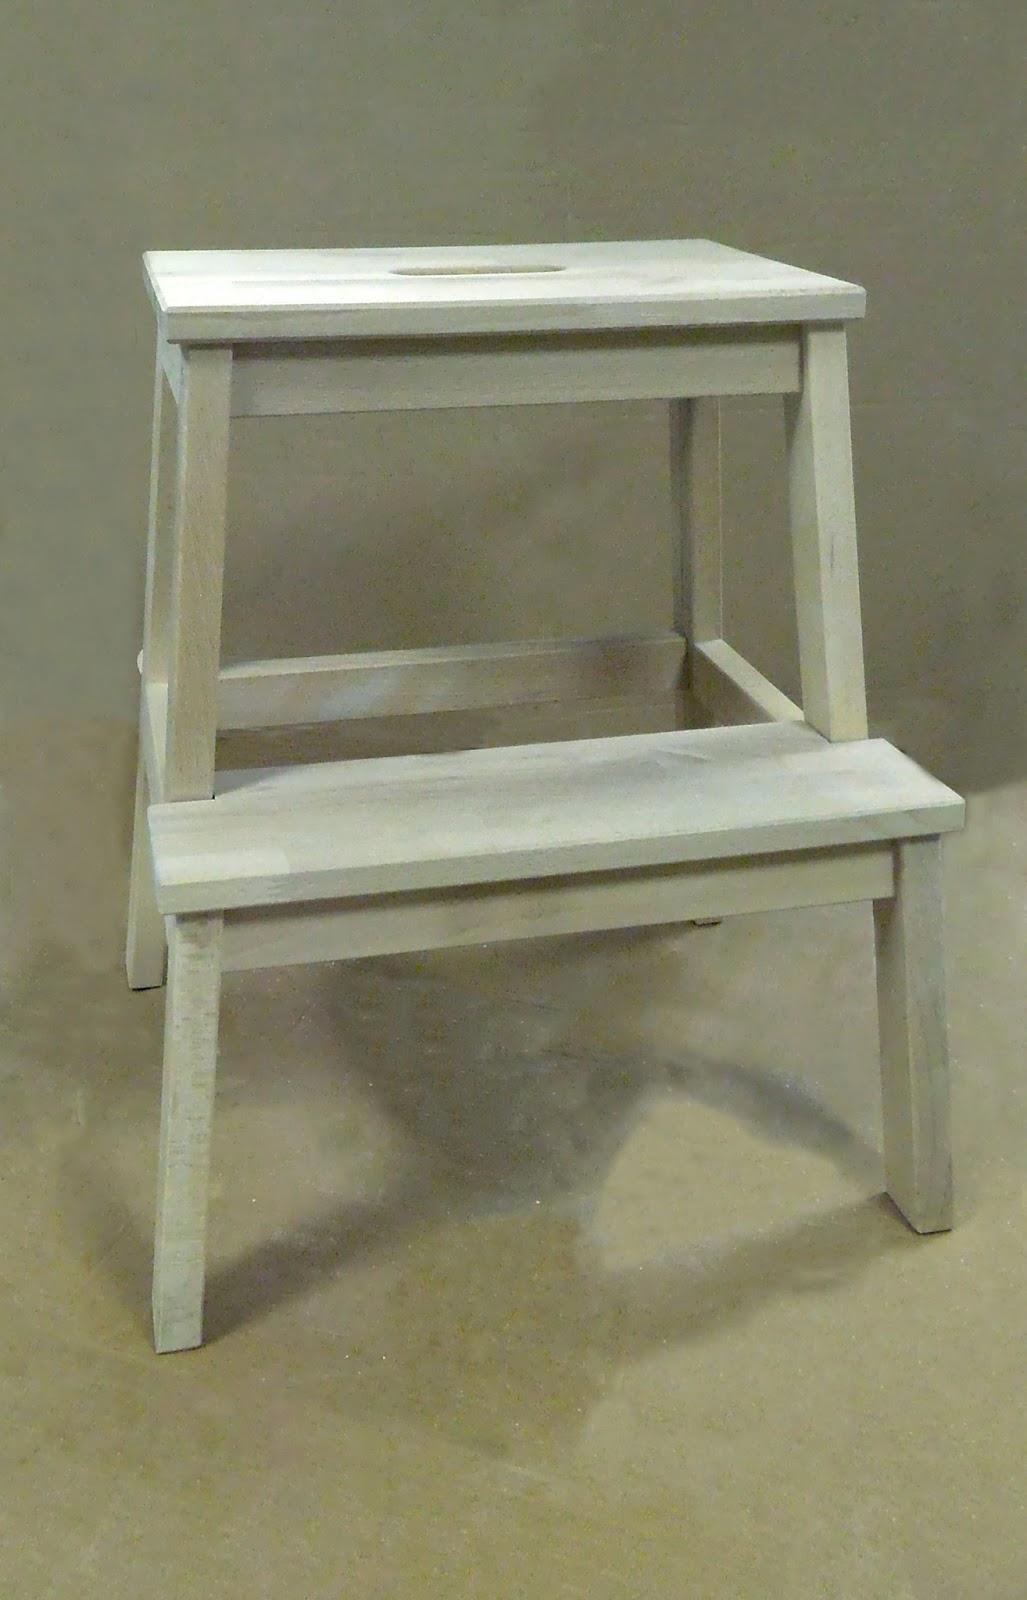 Renovarte muebles curso de restauraci n de muebles - Tecnicas de restauracion de muebles ...